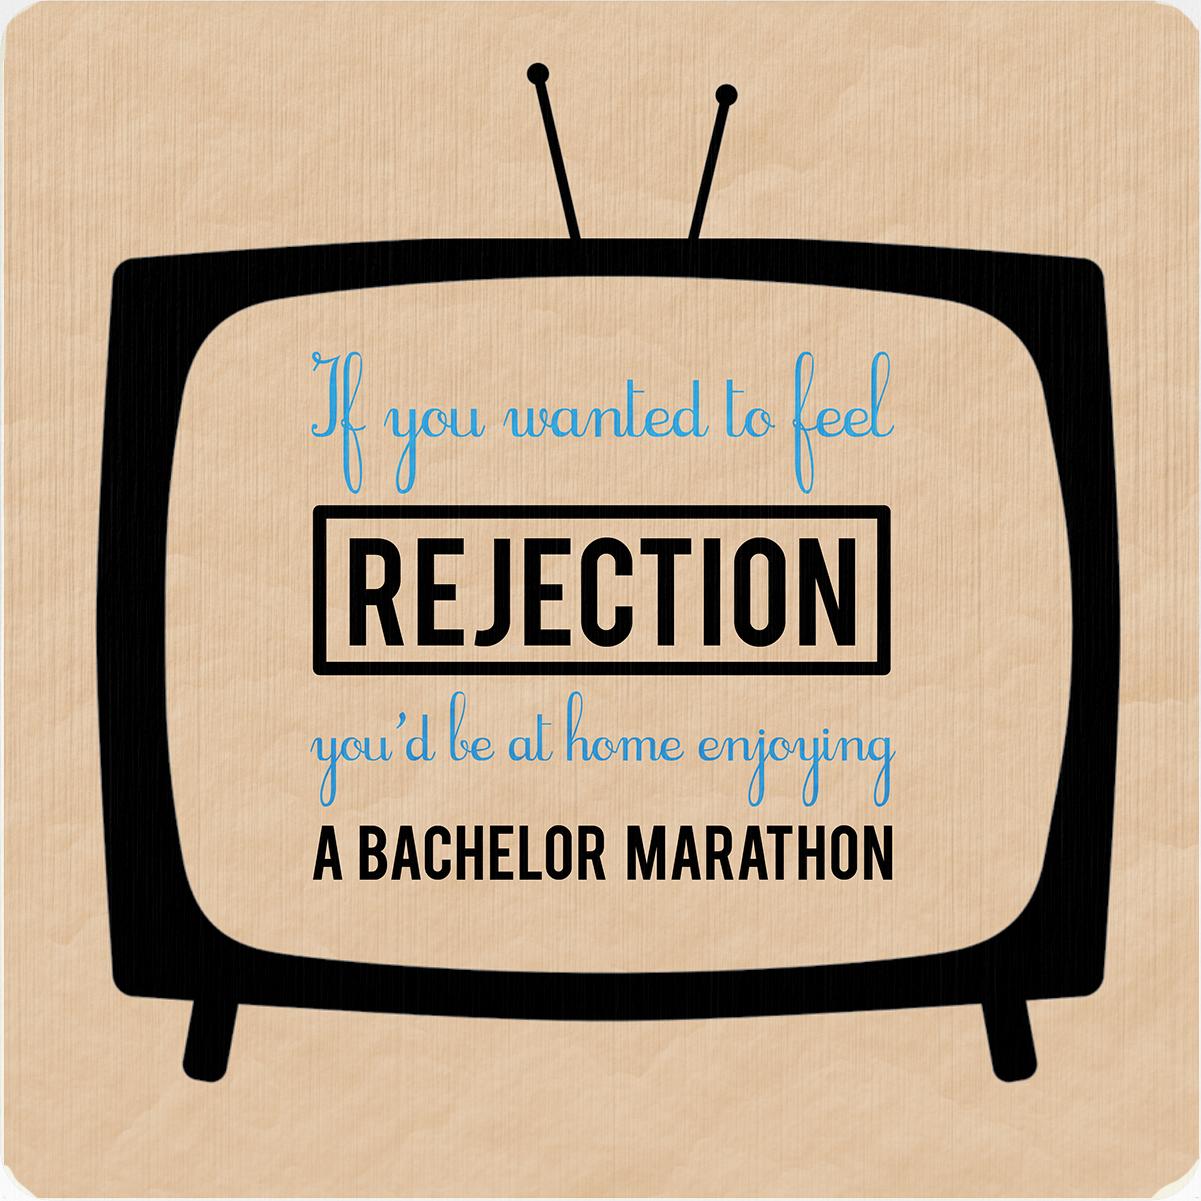 Rejection_Frontjpg.jpg